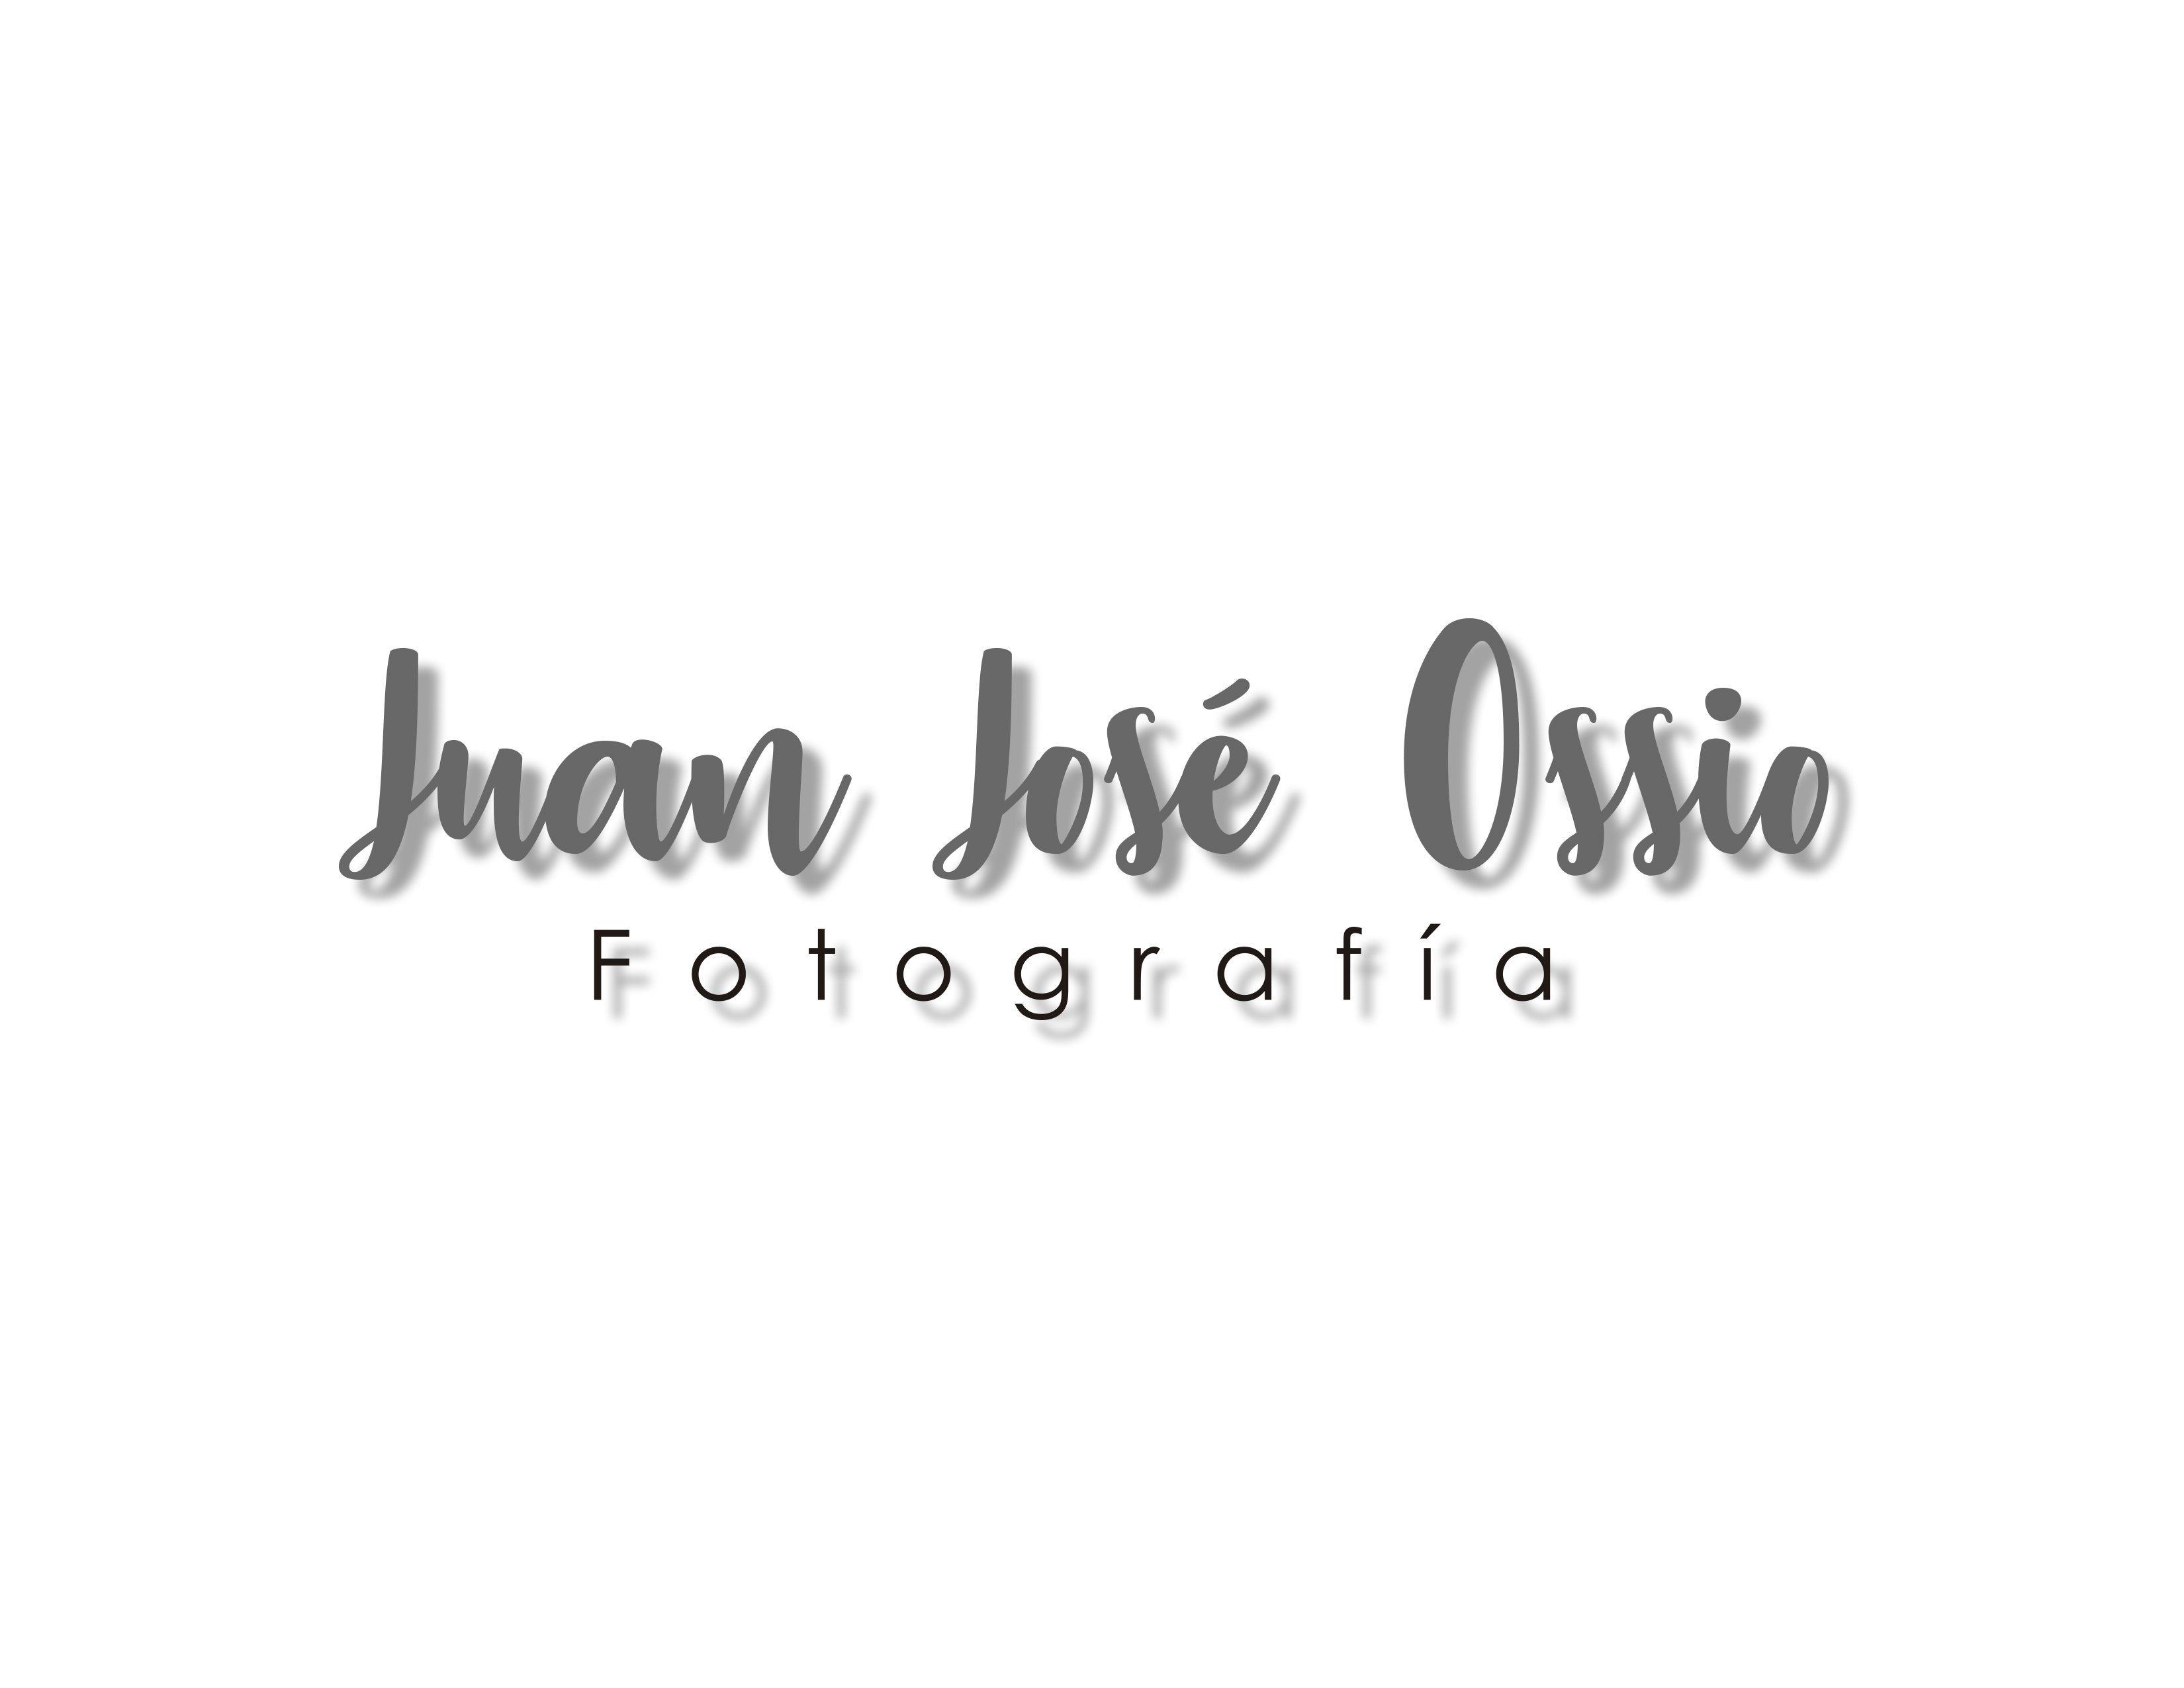 Juan Jose Ossio Fotografía